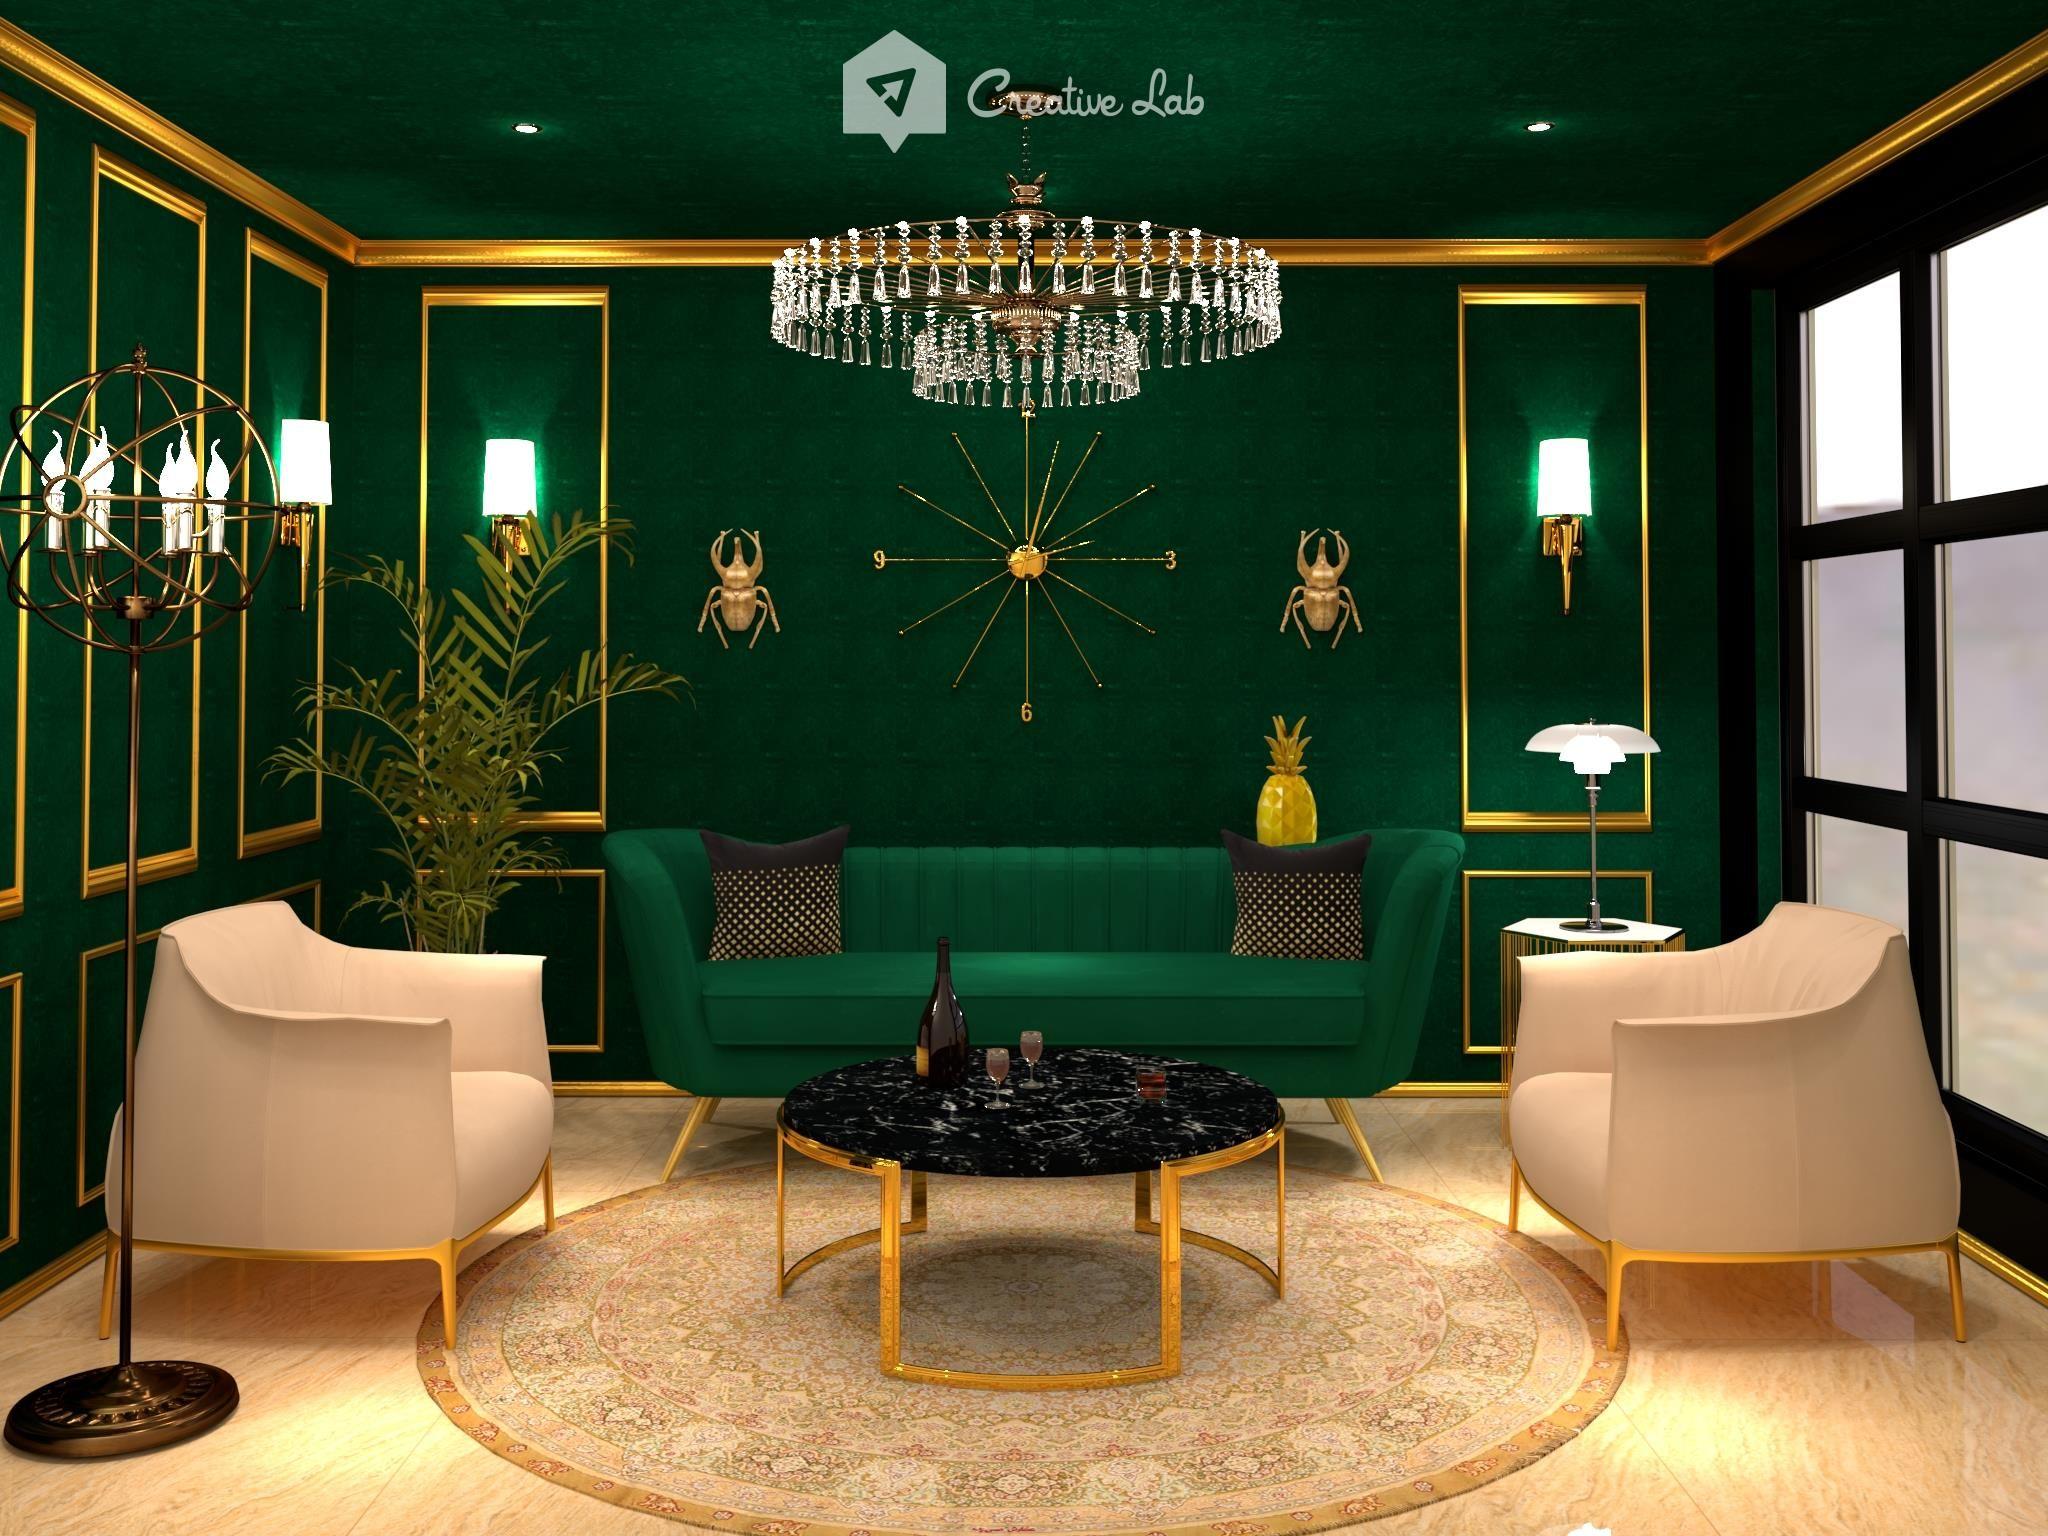 Mawi Livingroom Visoft360 In 2021 Art Deco Living Room Art Deco Home Interior Deco